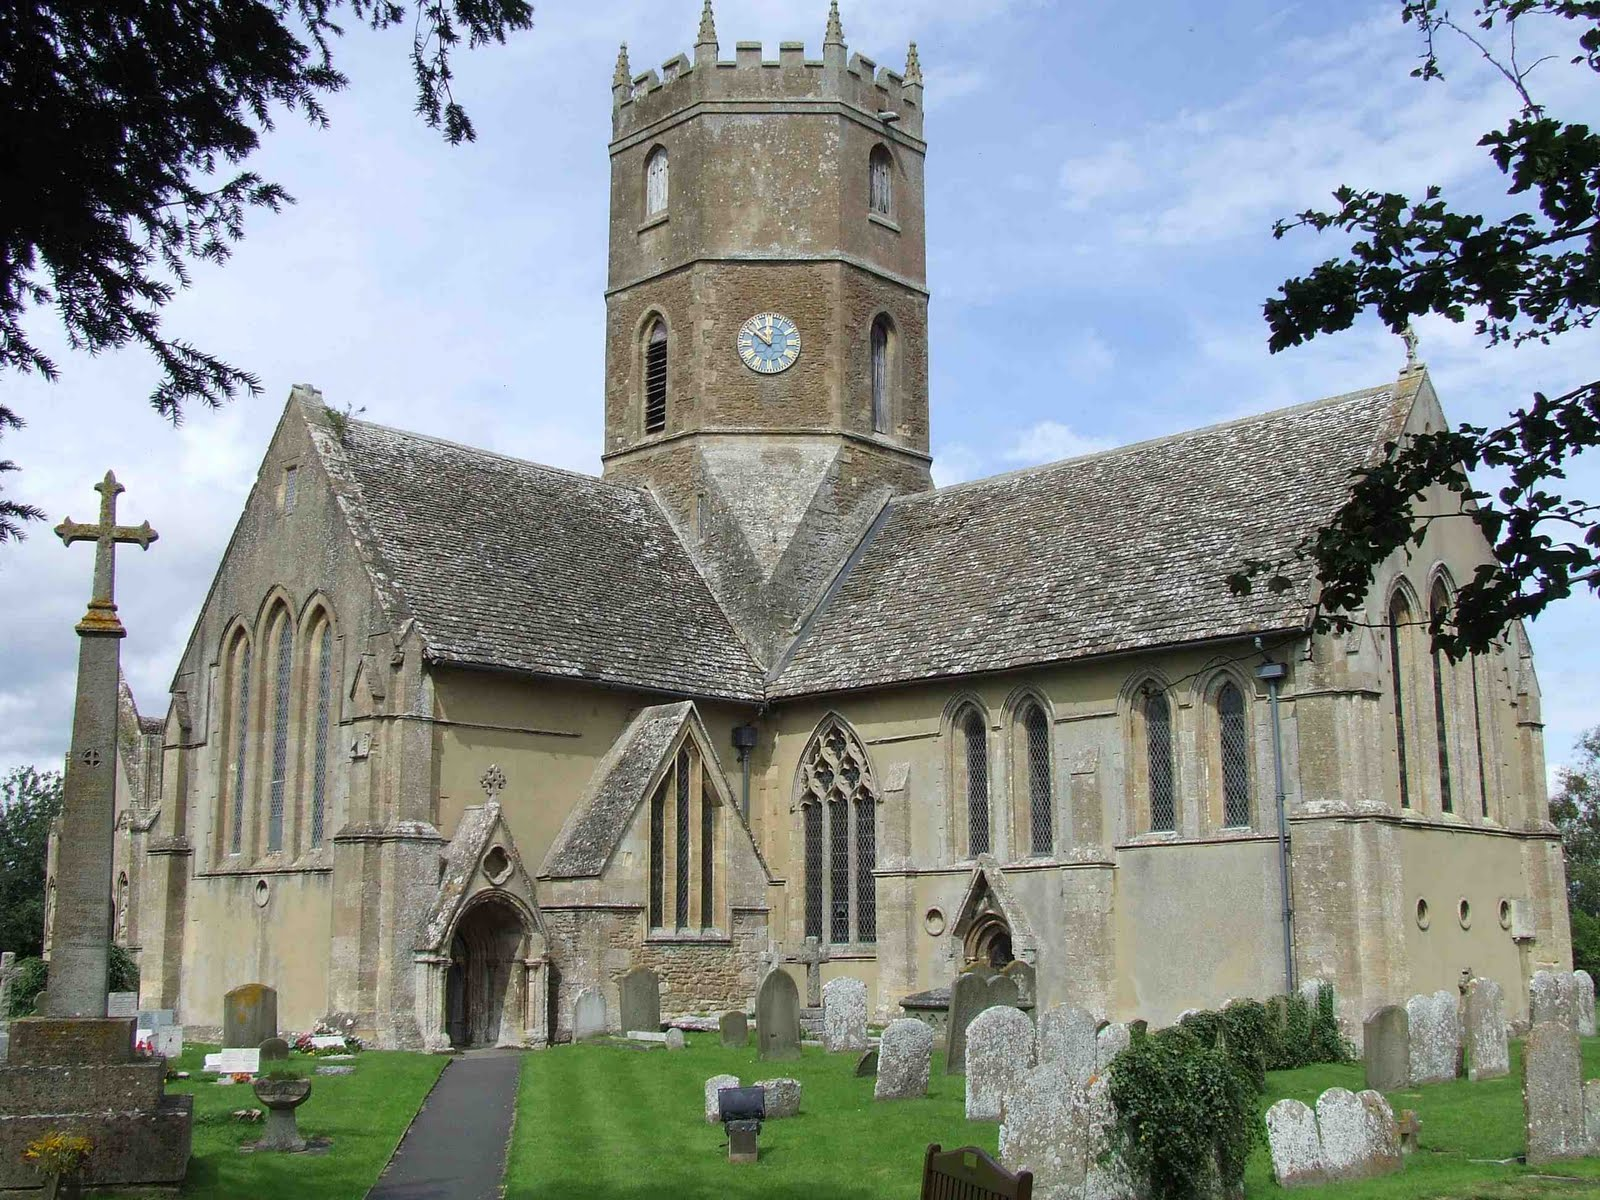 Uffington Oxfordshire Pointed Architecture